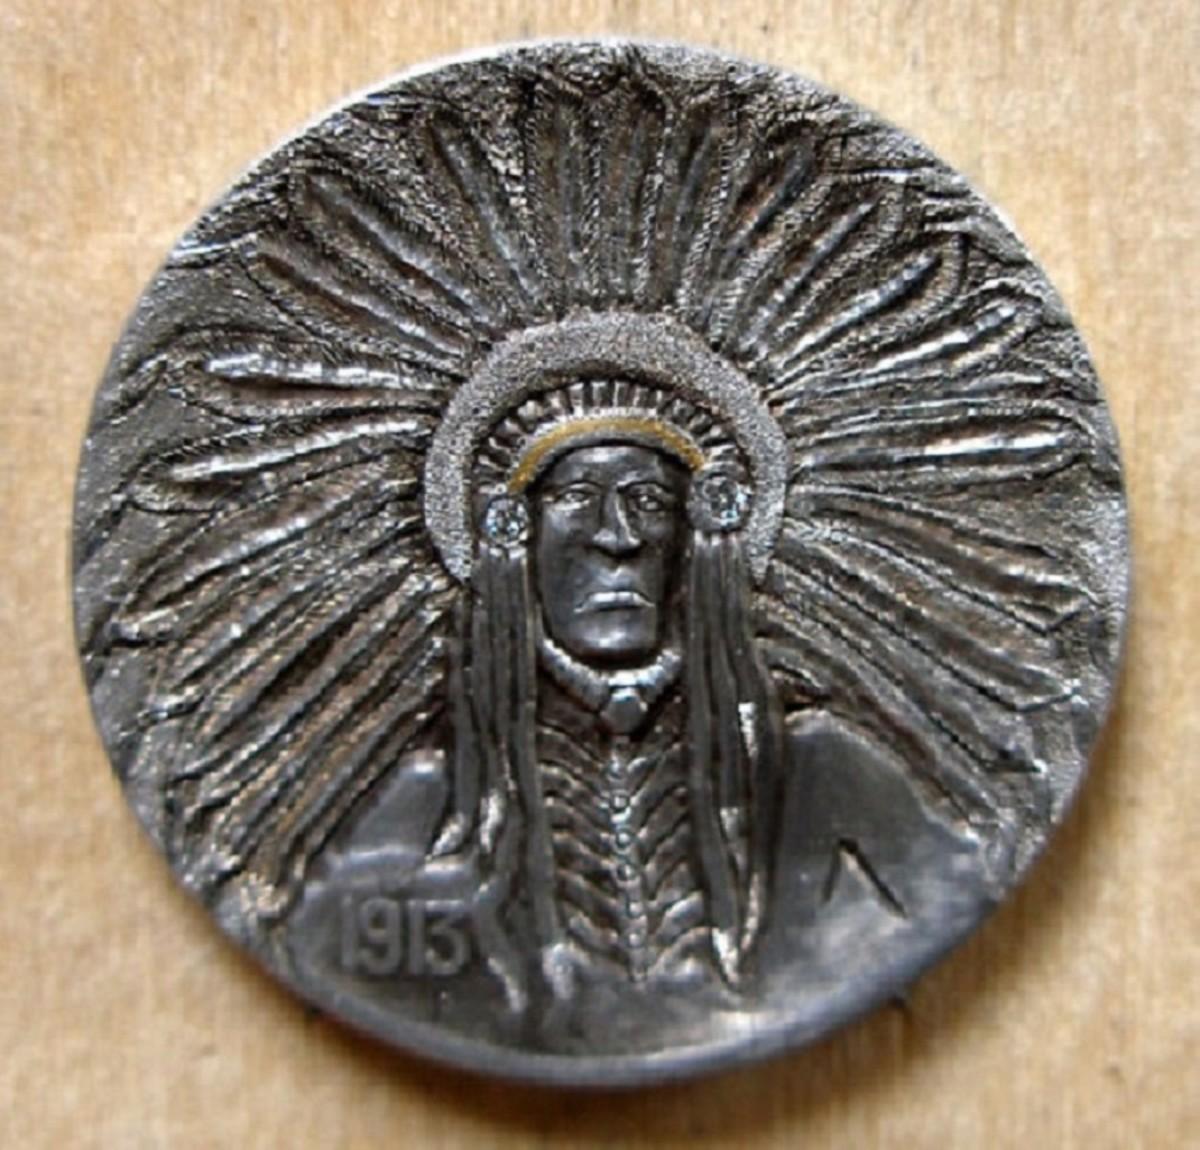 Chief Costalotta 1913 buffalo nickel